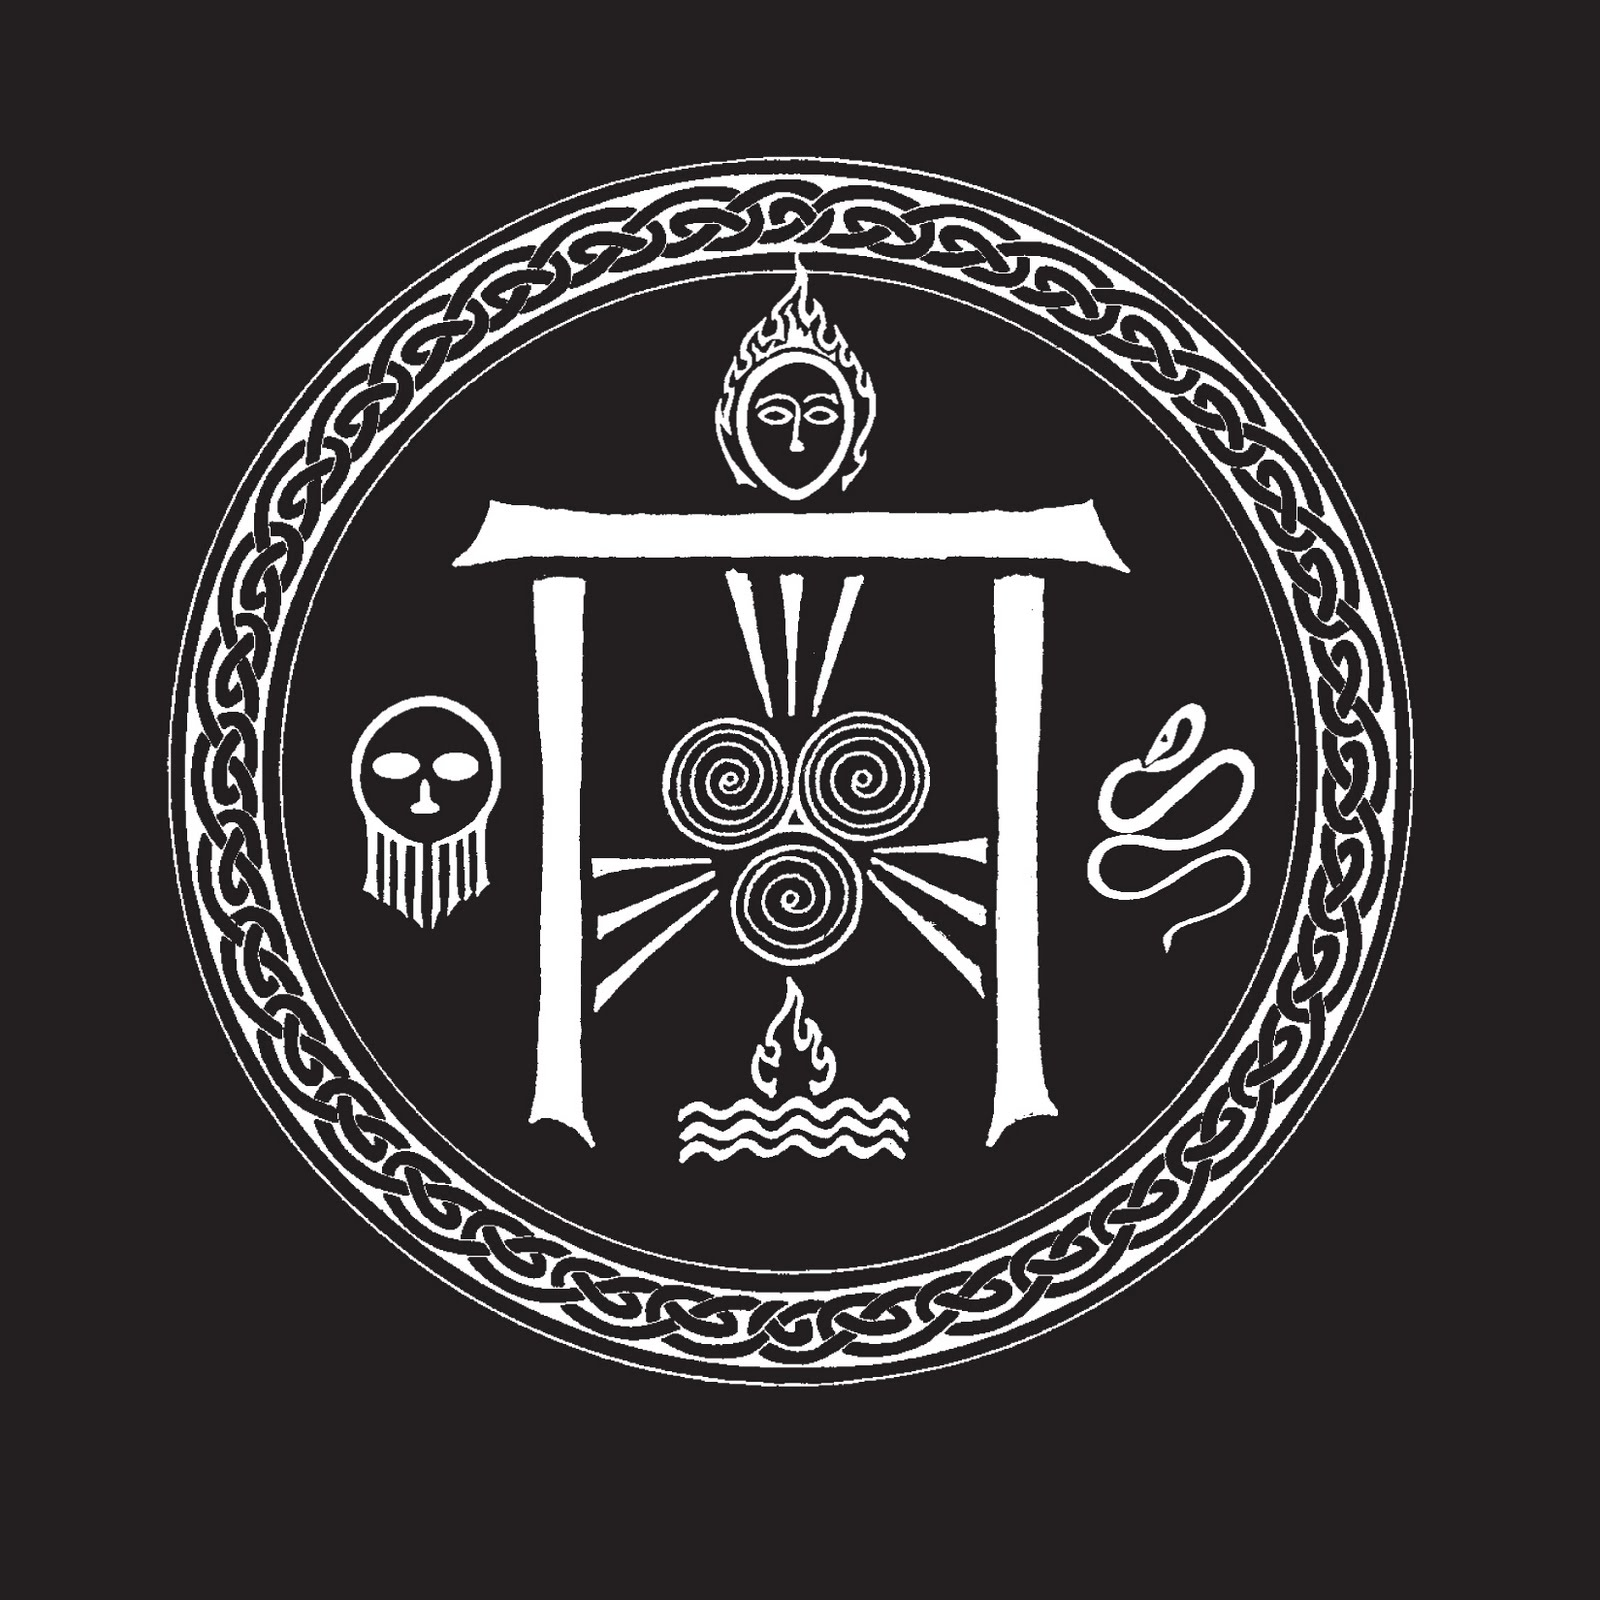 Druid Symbols Images - Reverse Search